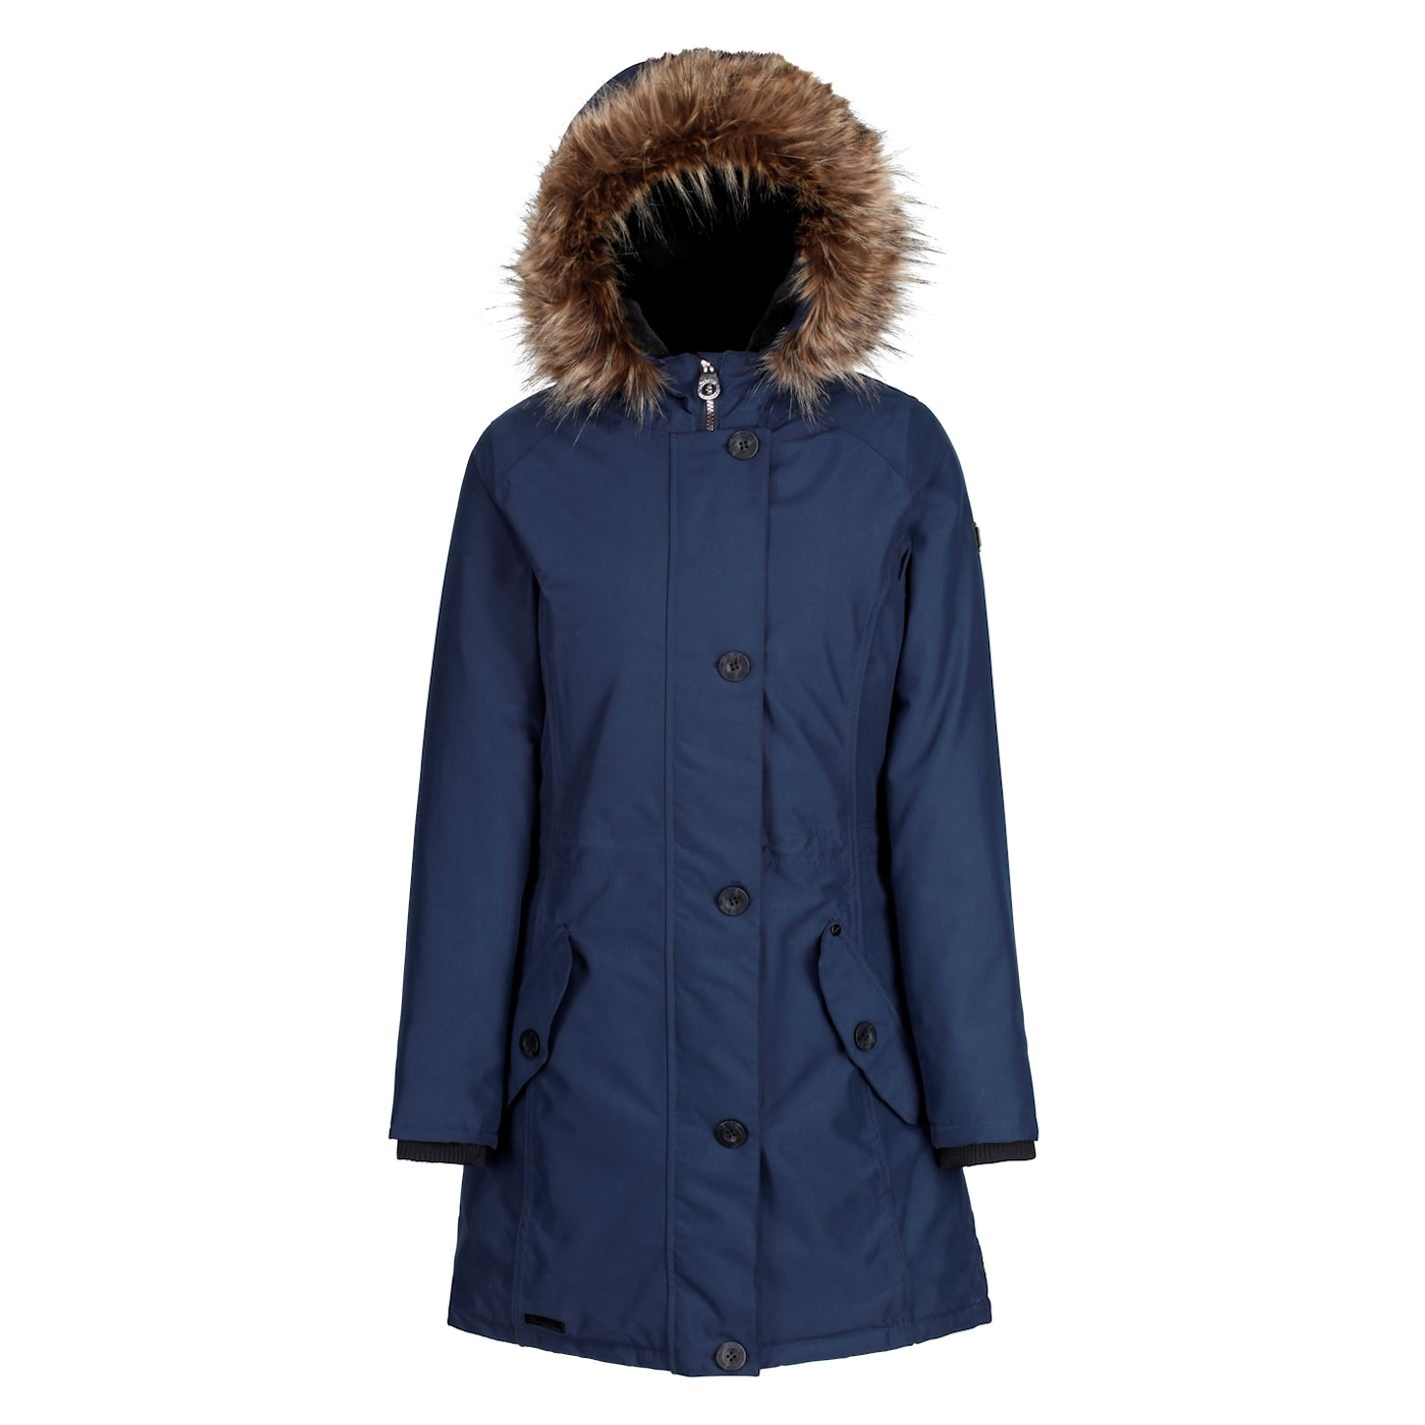 Regatta Saffira Insulated Jacket Ladies